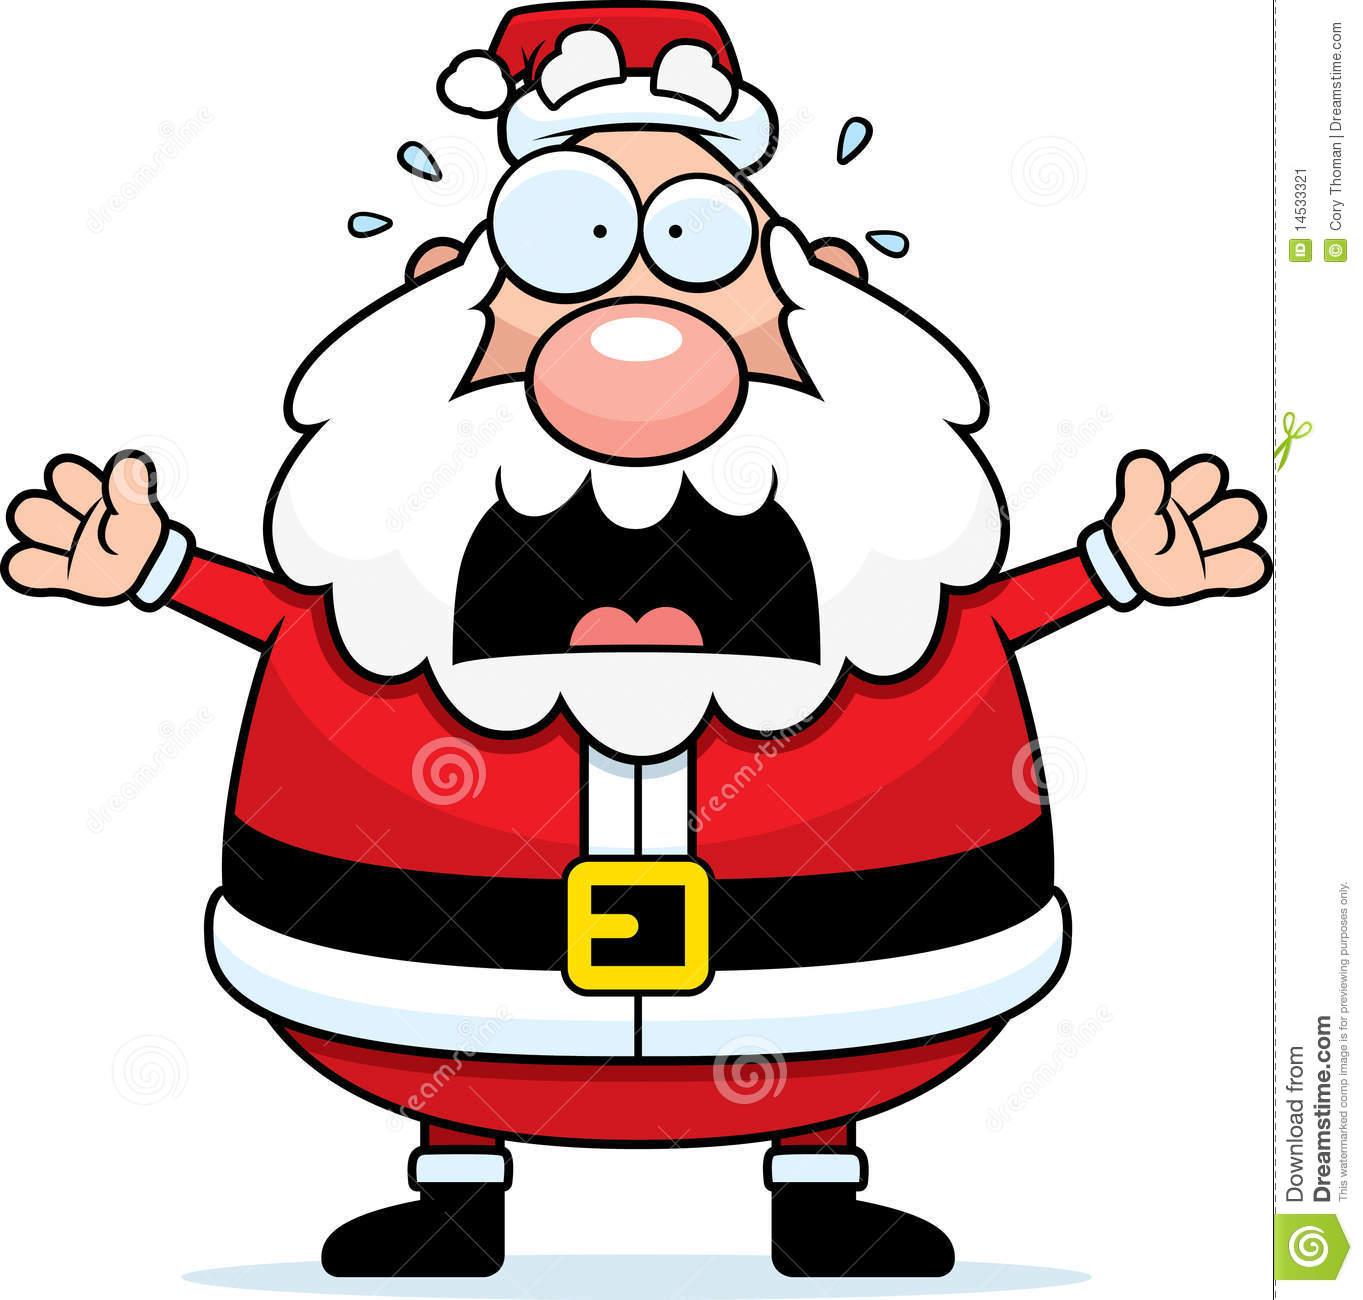 Santa clipart creepy #1